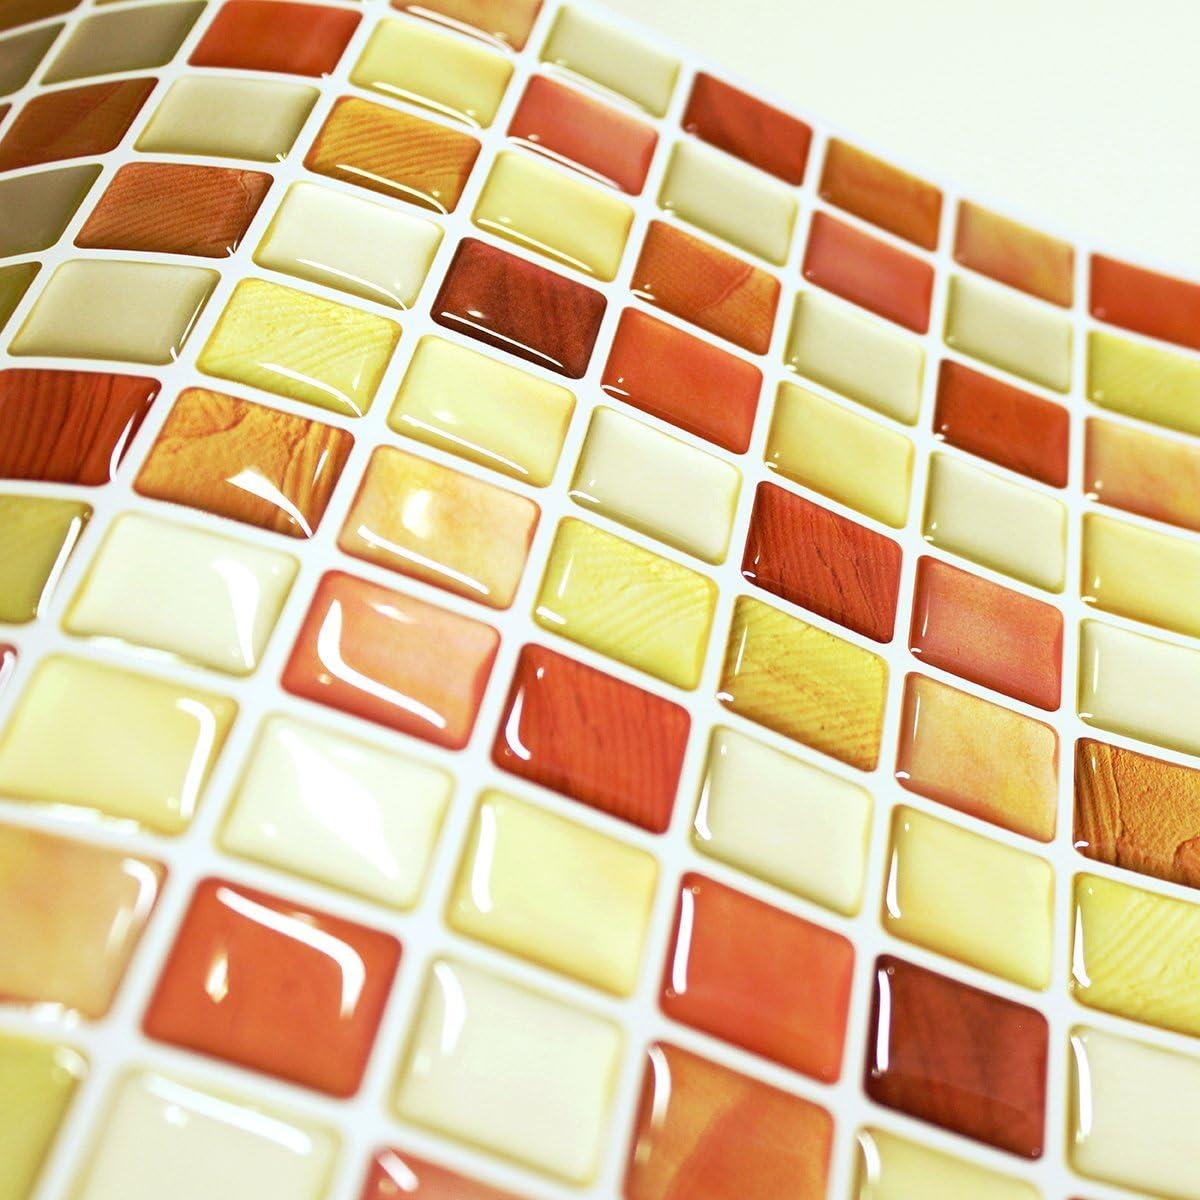 Crack Orange 10, 12.2 x 12.2 BEAUSTILE Decorative Tile Stickers Peel Stick Backsplash Fire Retardant Tile Sheet